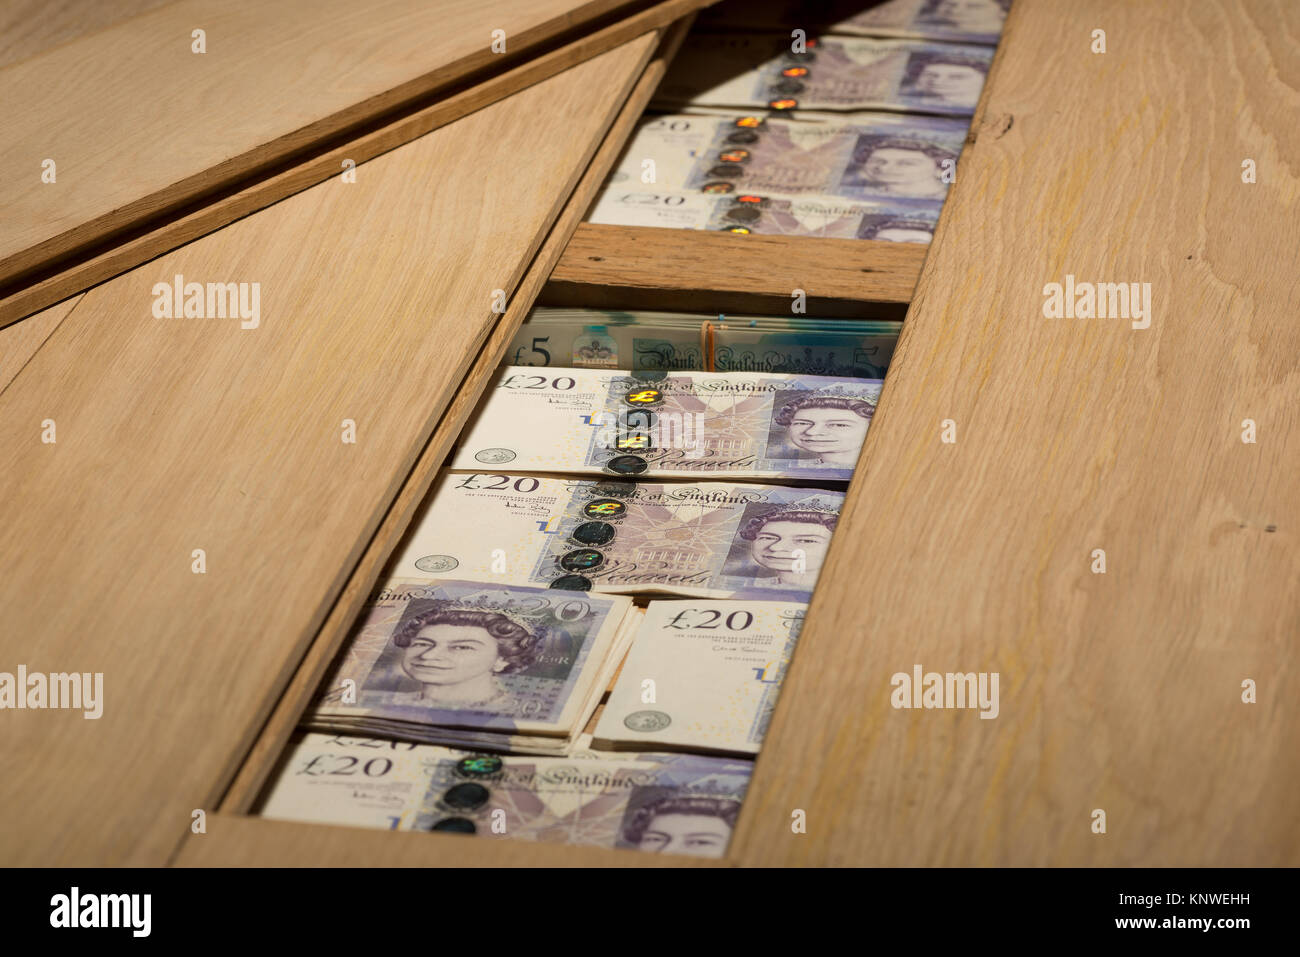 Poor interest bank rates, money £5 £20 hidden under oak wooden floor boards as alternative to safety deposit concealed Stock Photo